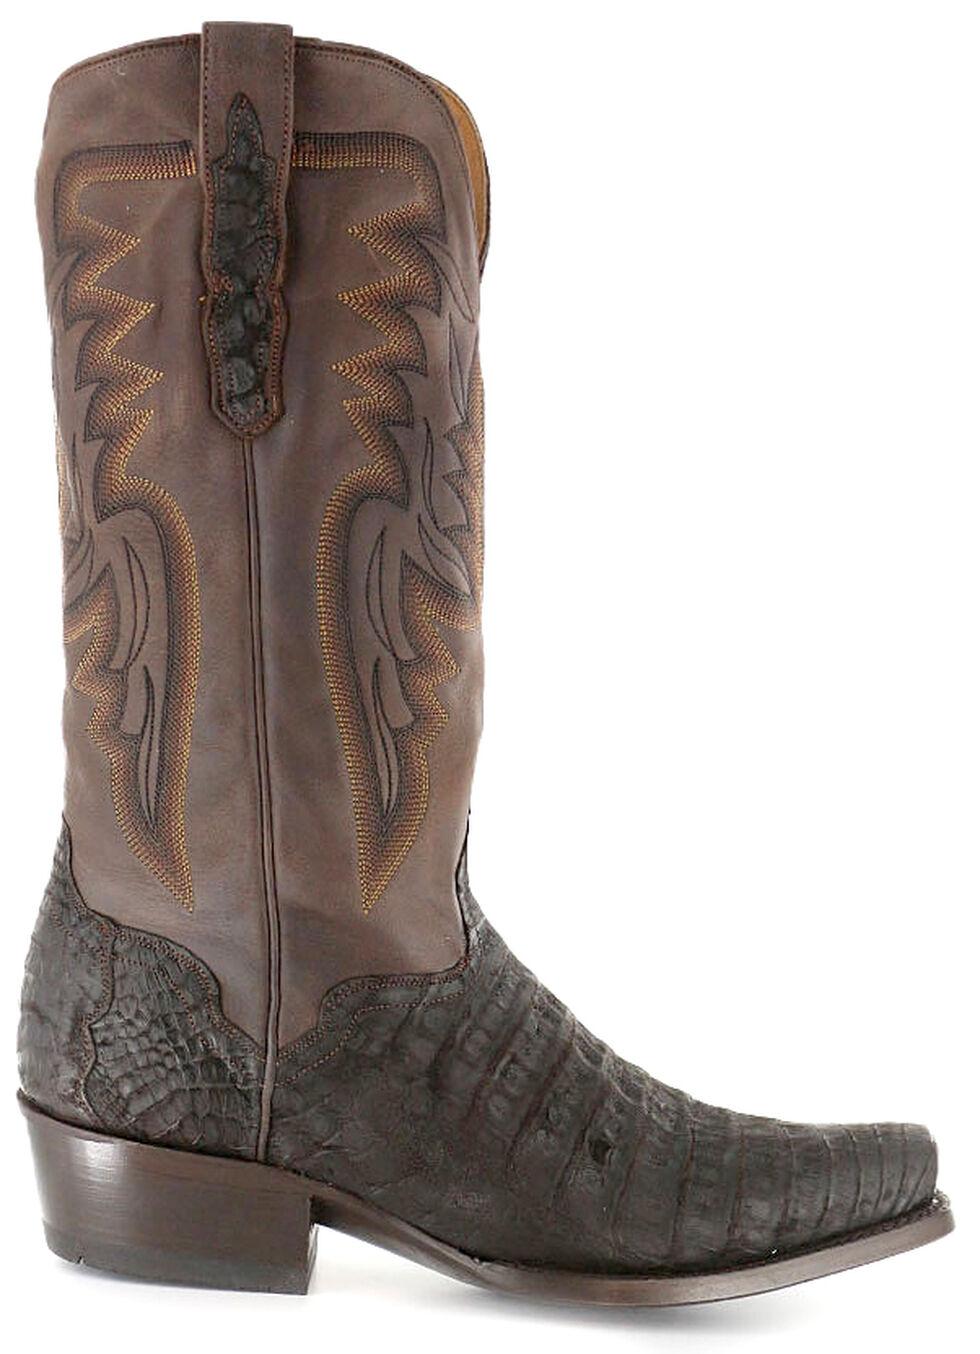 El Dorado Handmade Chocolate Caiman Belly Cowboy Boots - Square Toe, Chocolate, hi-res